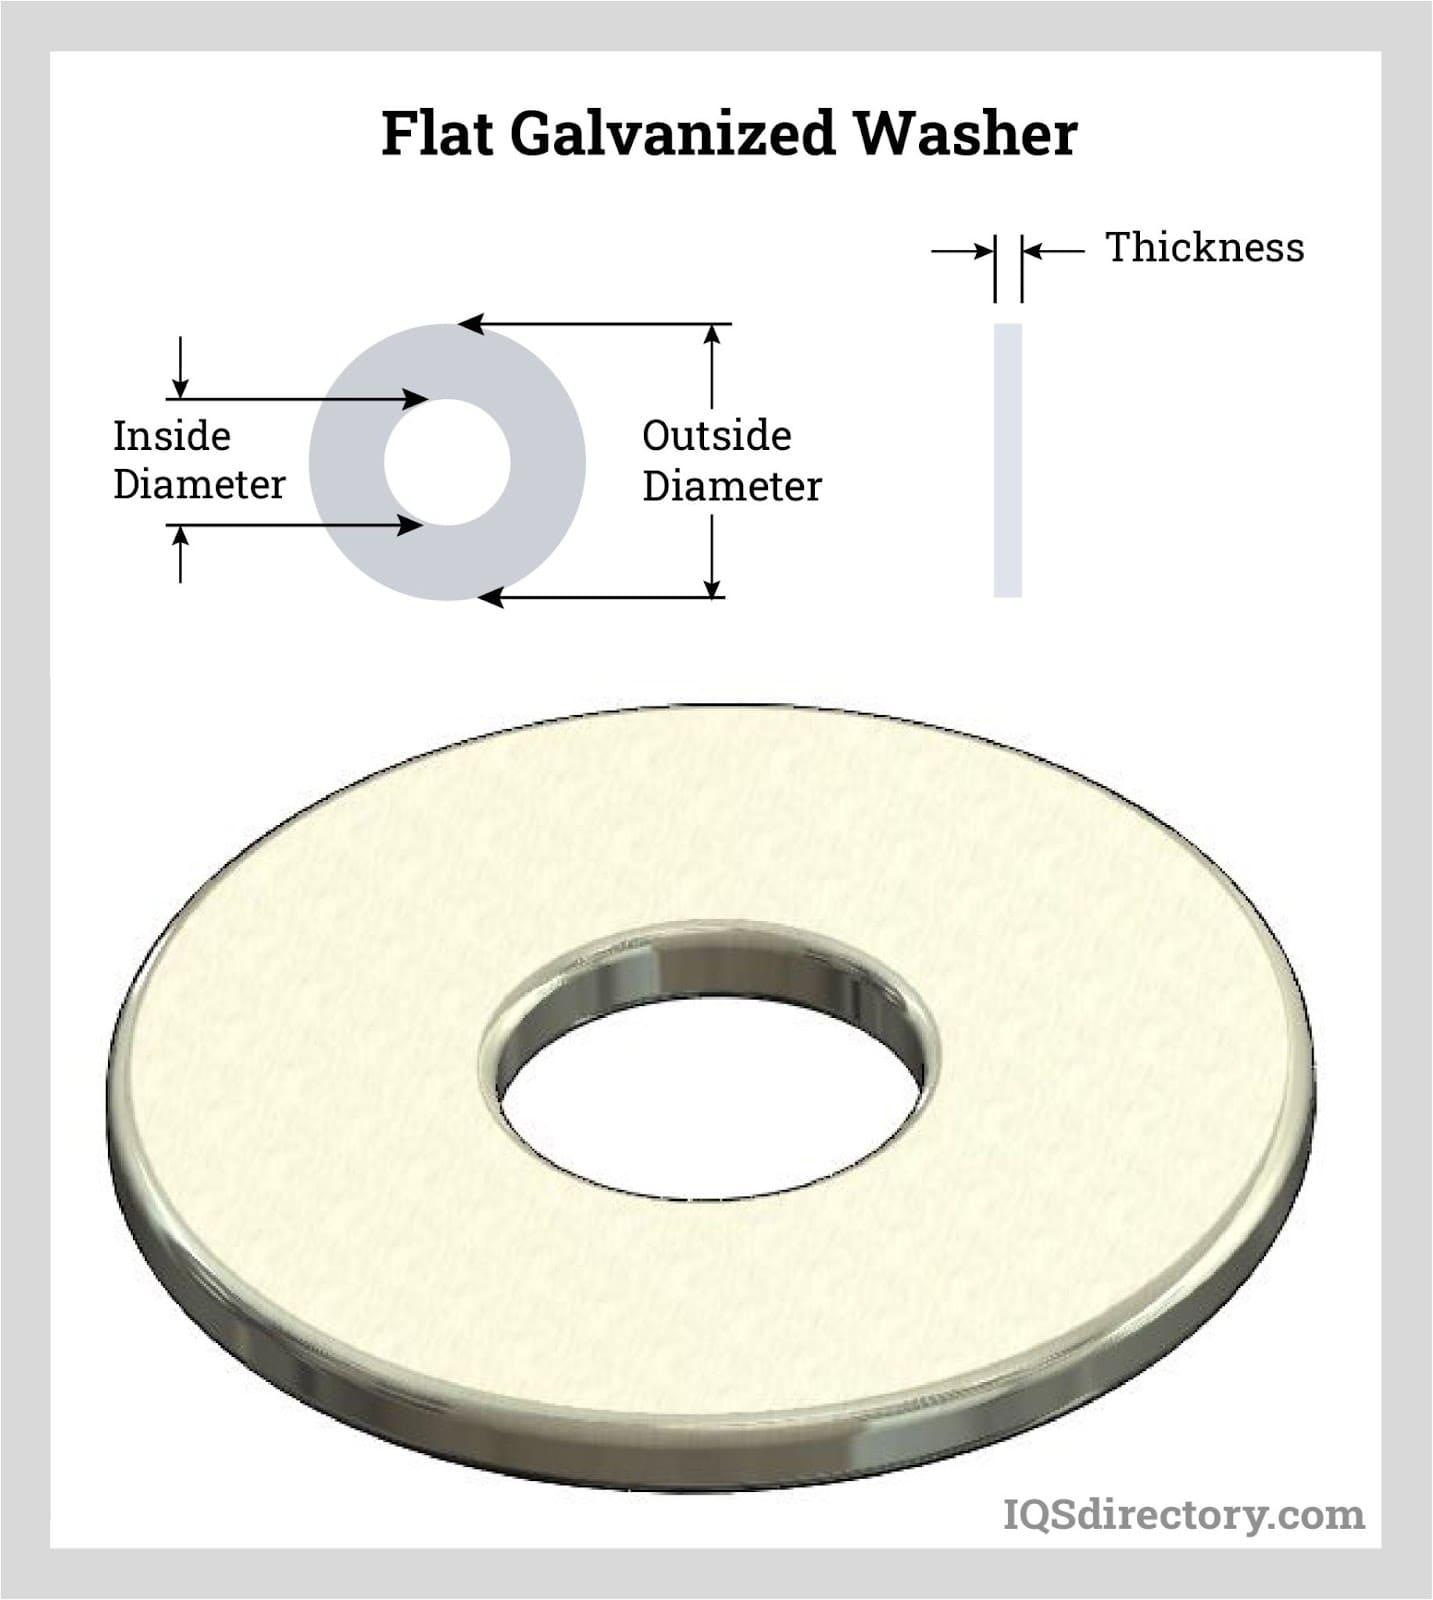 Flat Galvanized Washer